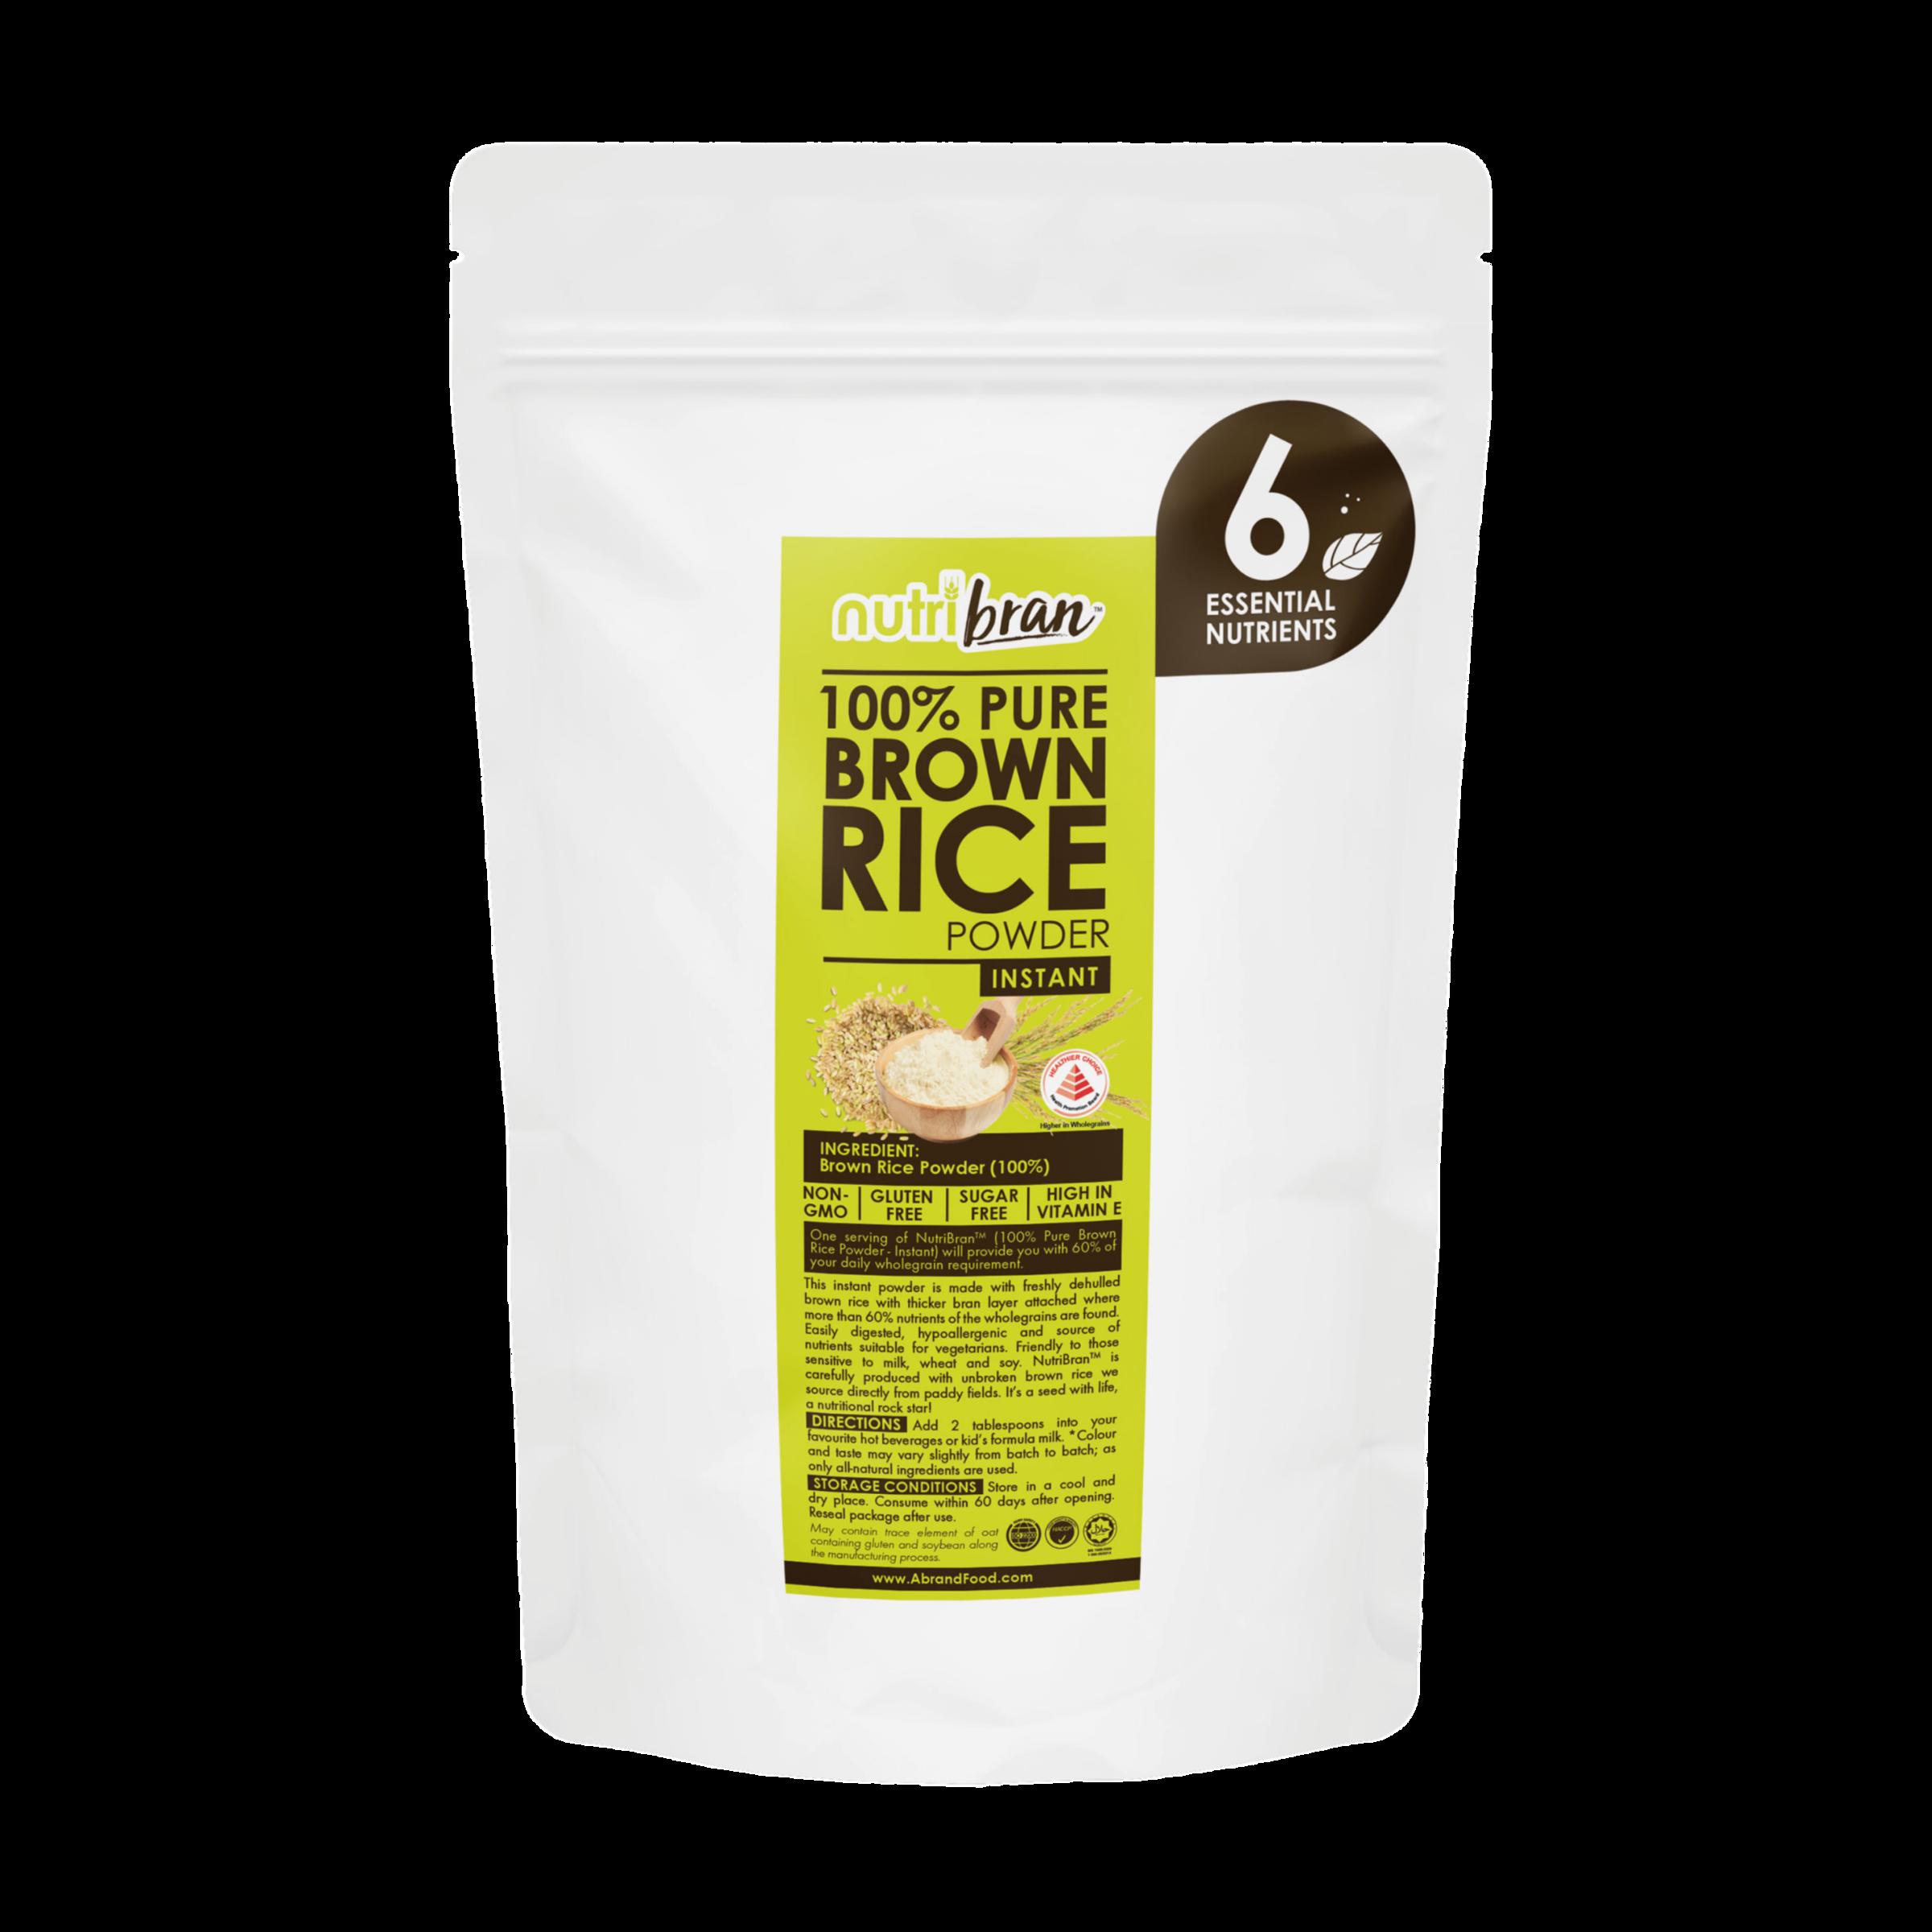 NutriBran (100% Pure Brown Rice Powder).png